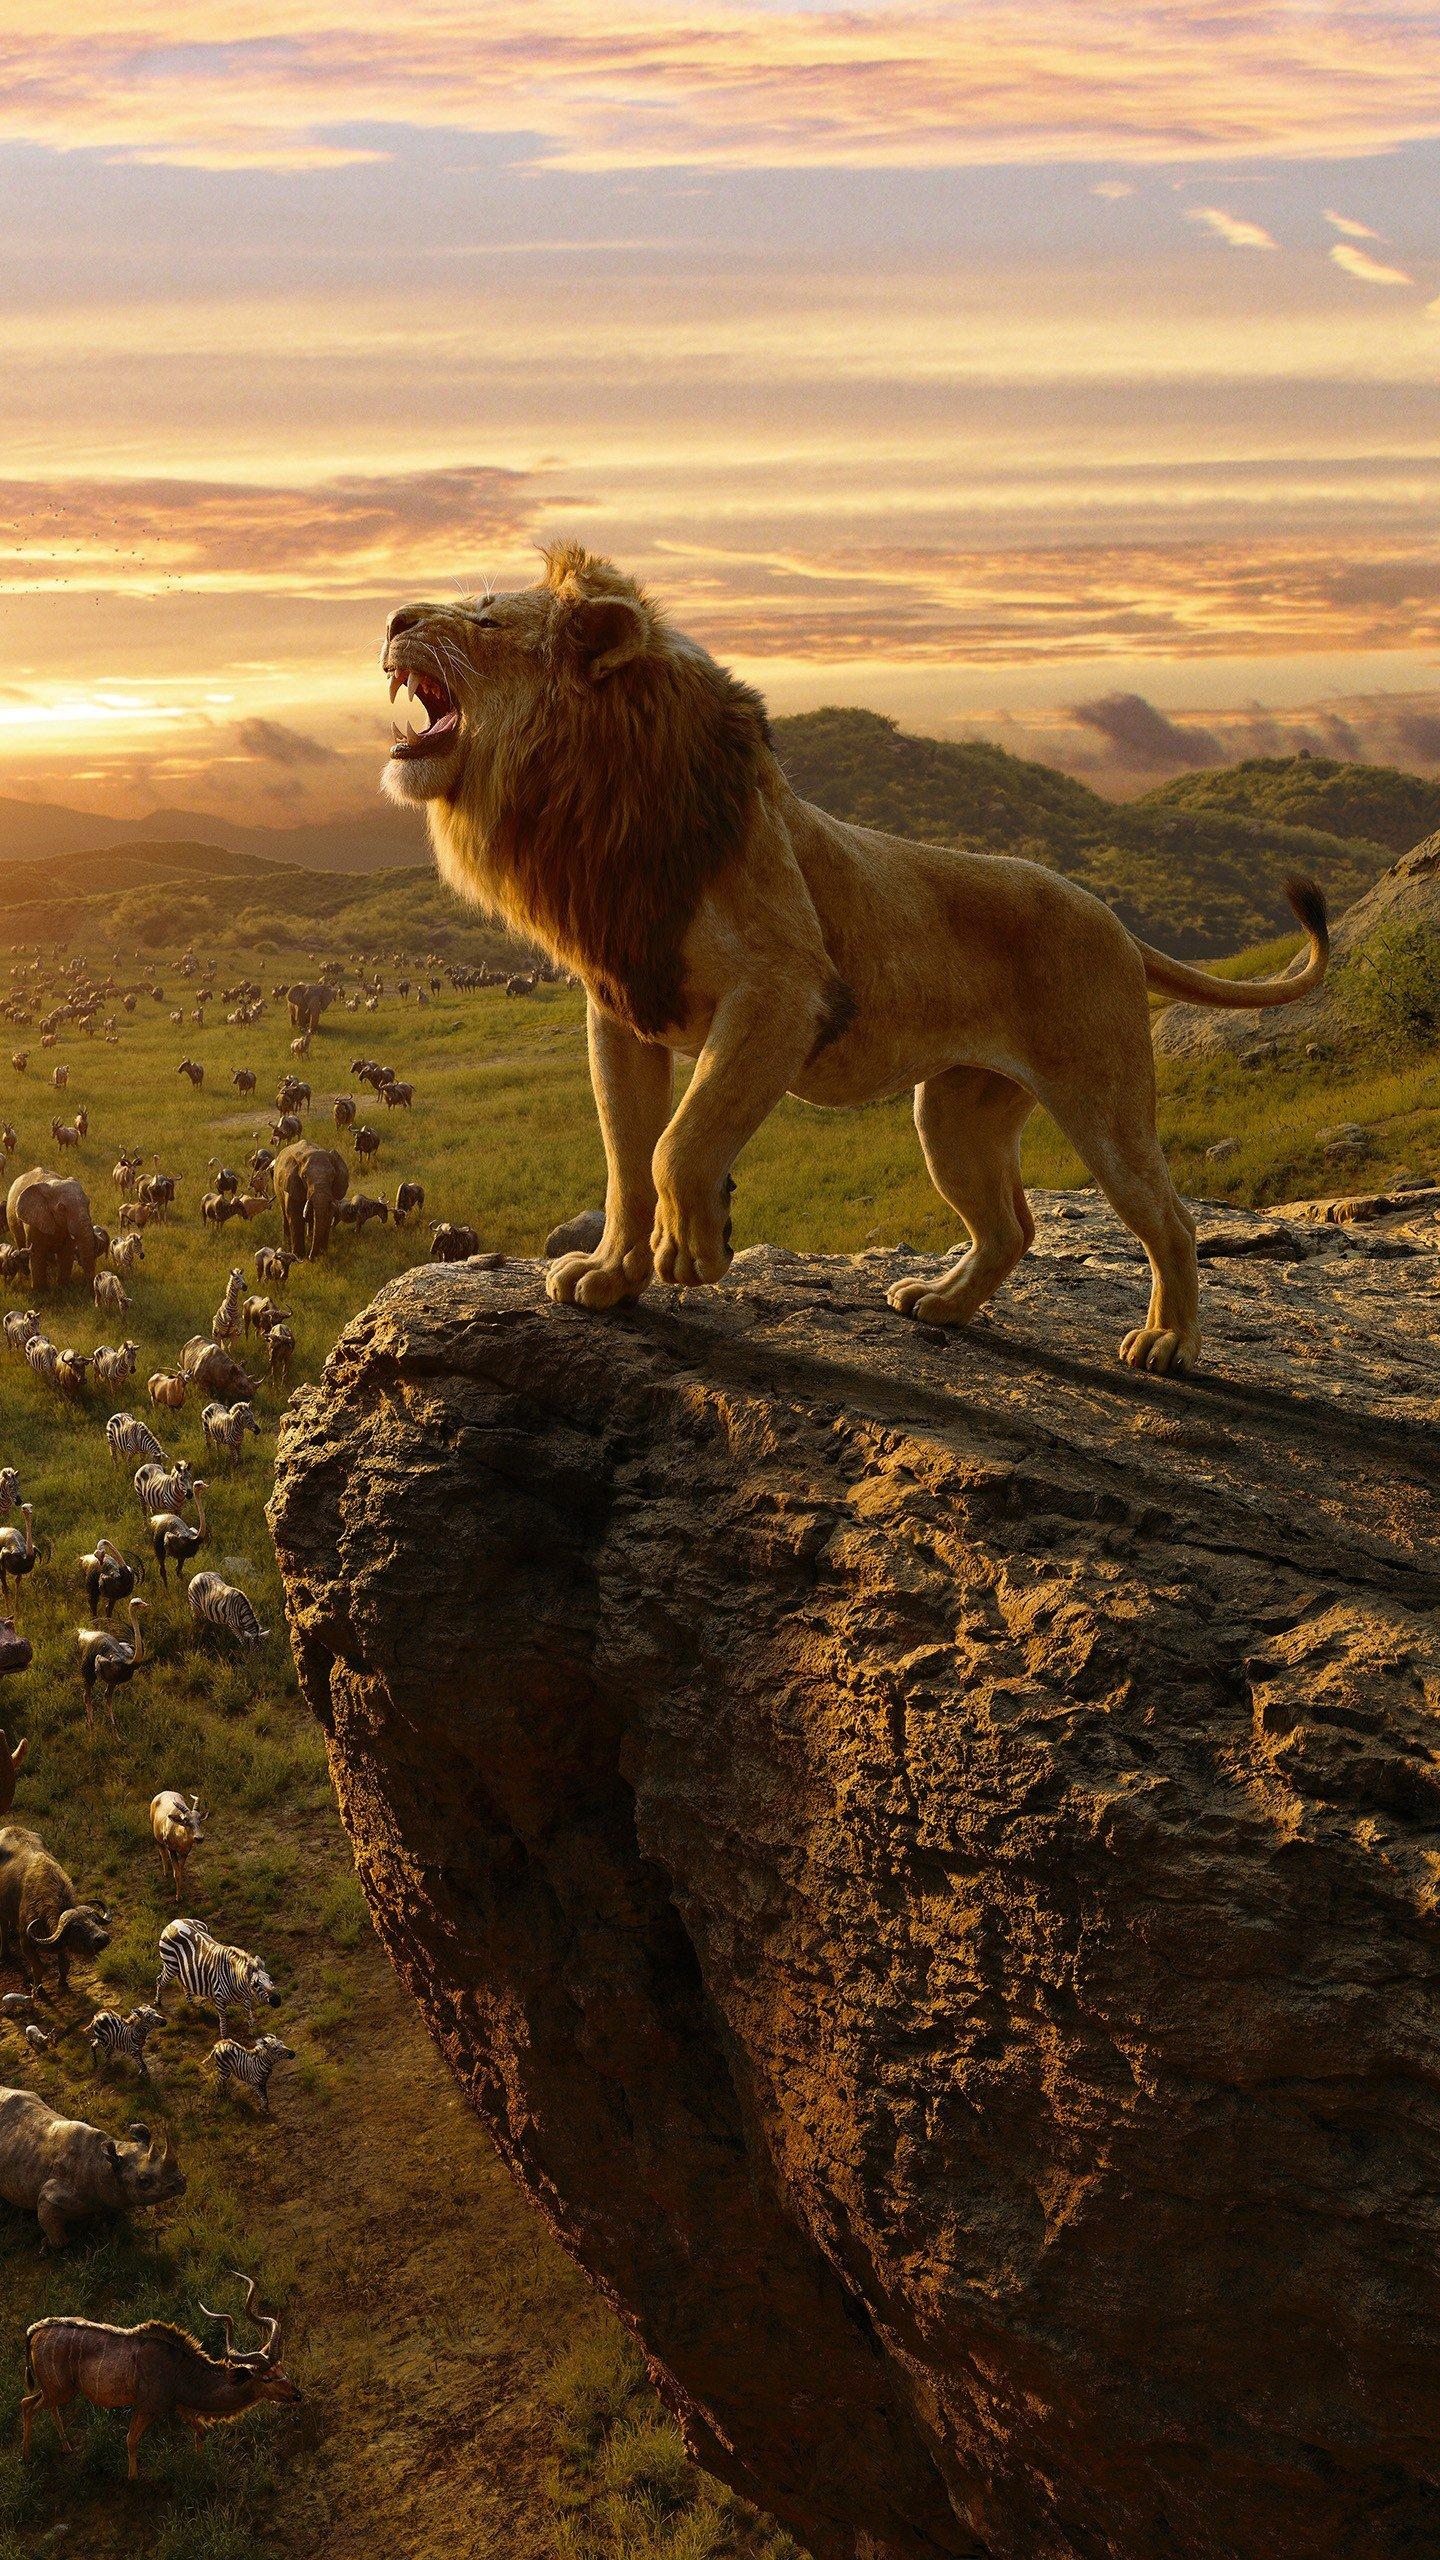 Lion Wallpaper Iphone , HD Wallpaper & Backgrounds